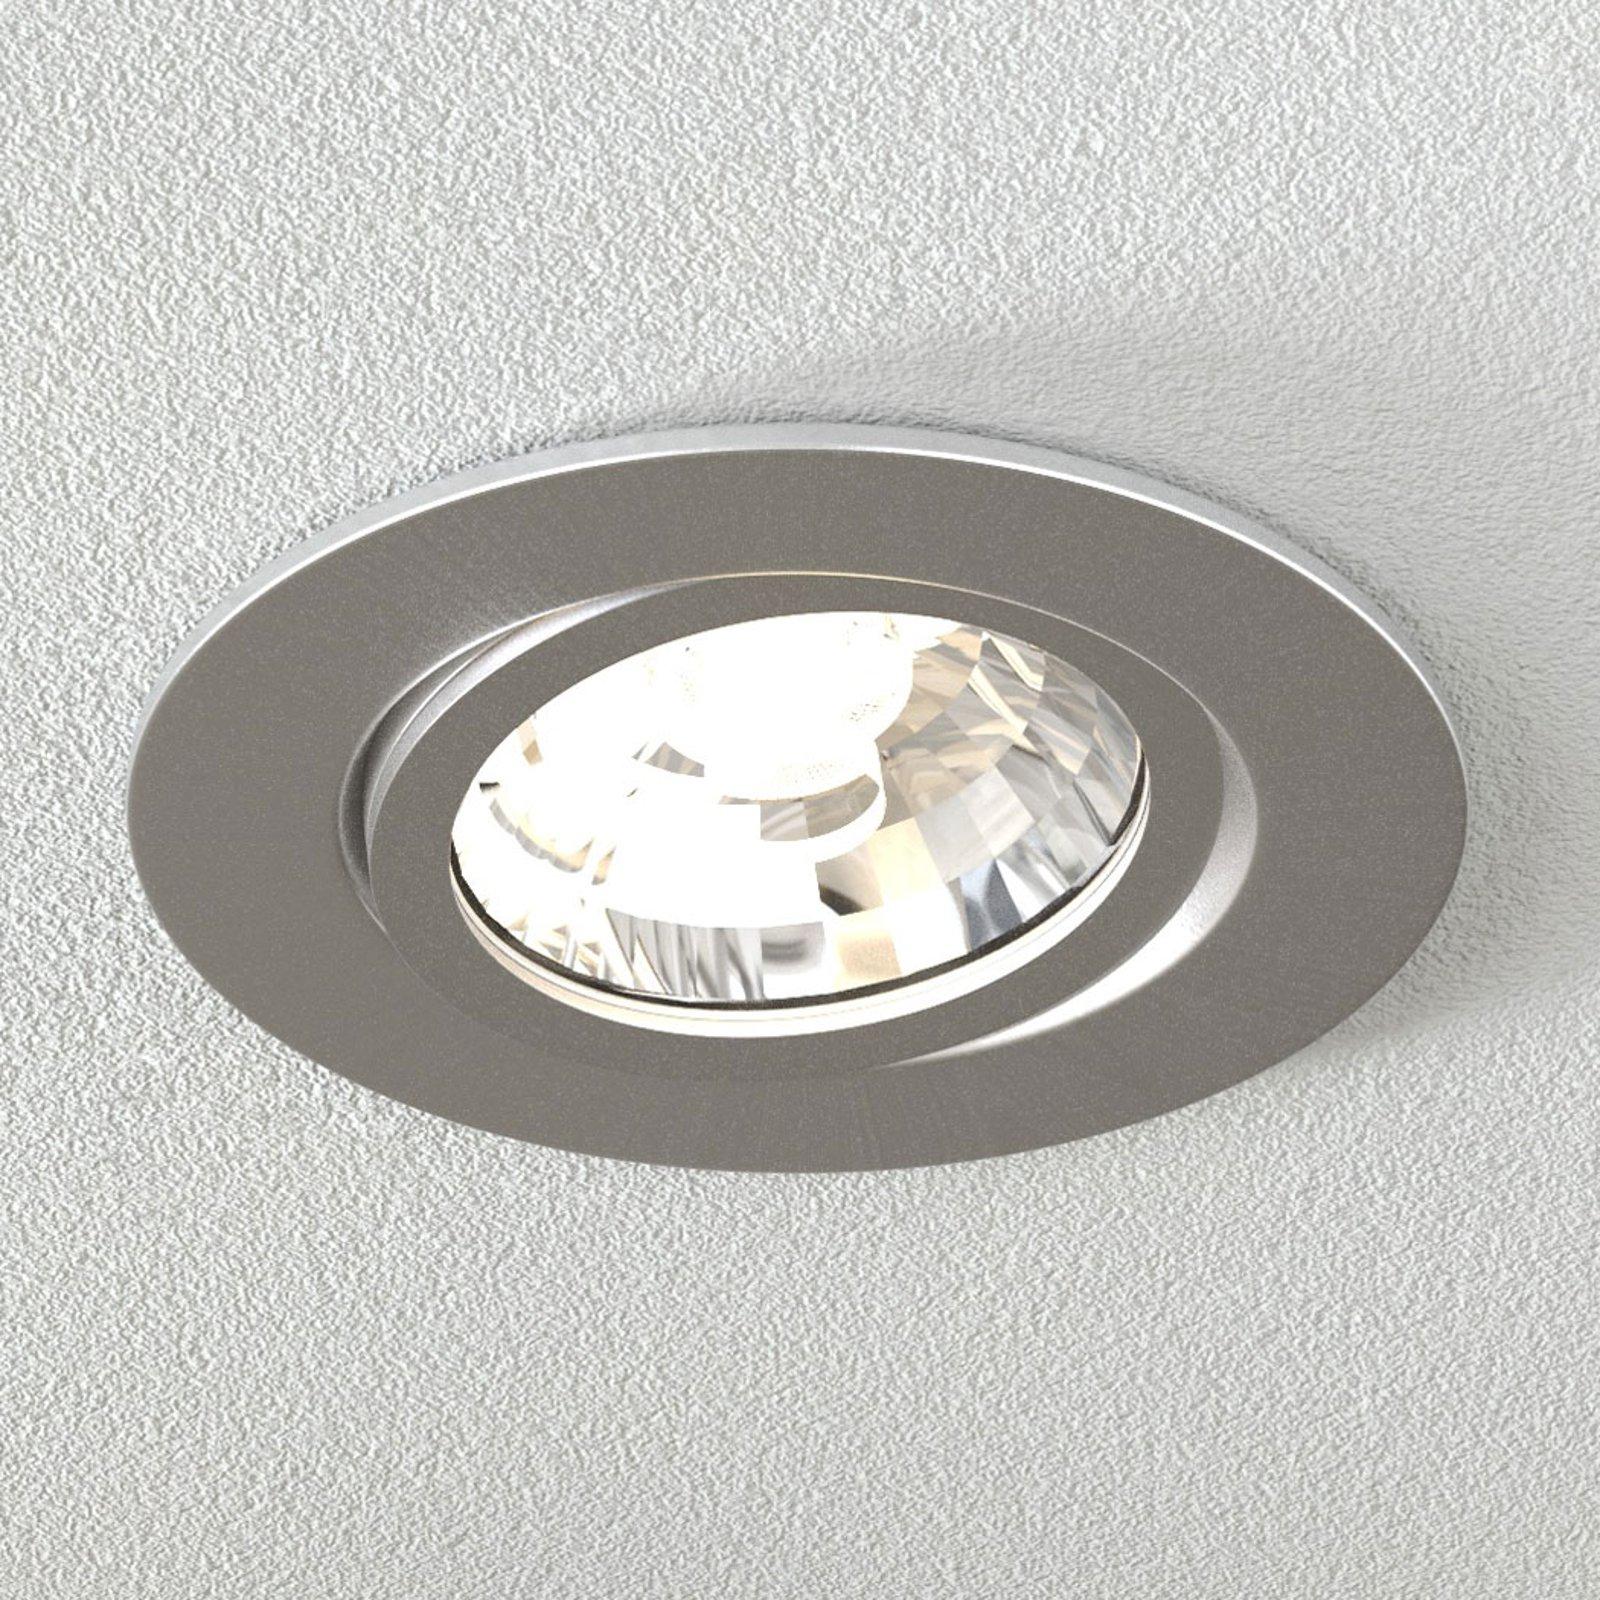 Rico LED innfellingsslampe, 6,5 W, børstet stål